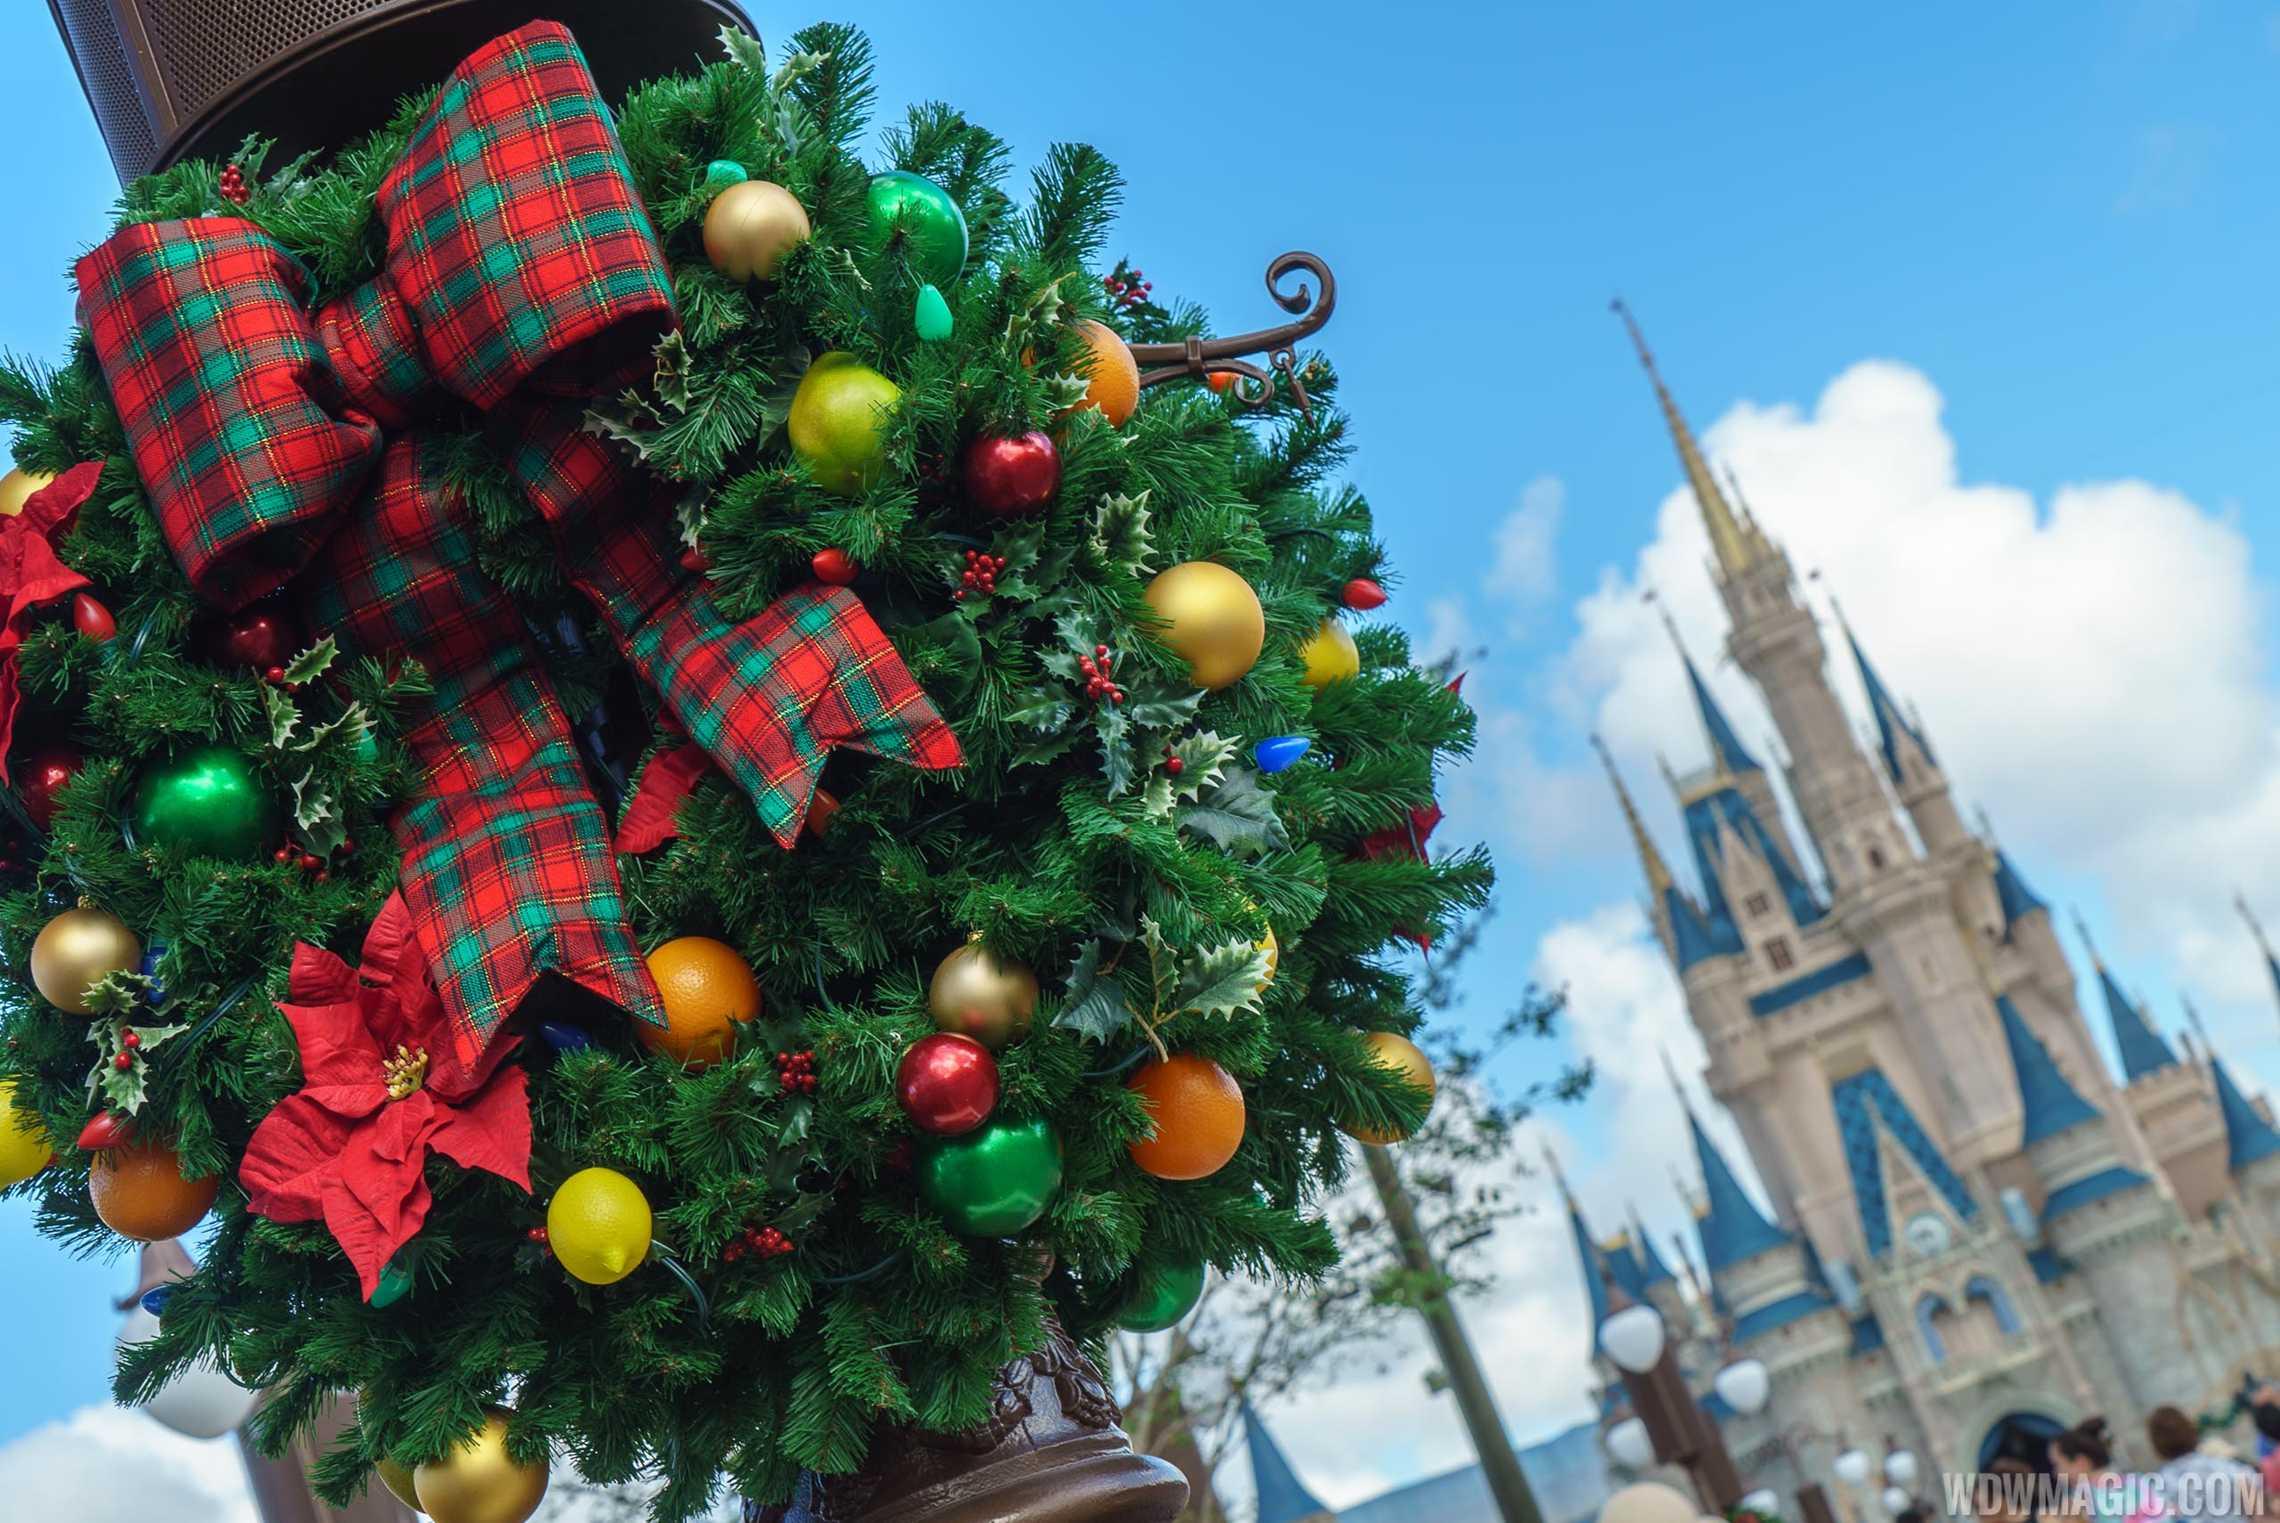 Photos Holidays Get Underway At The Magic Kingdom